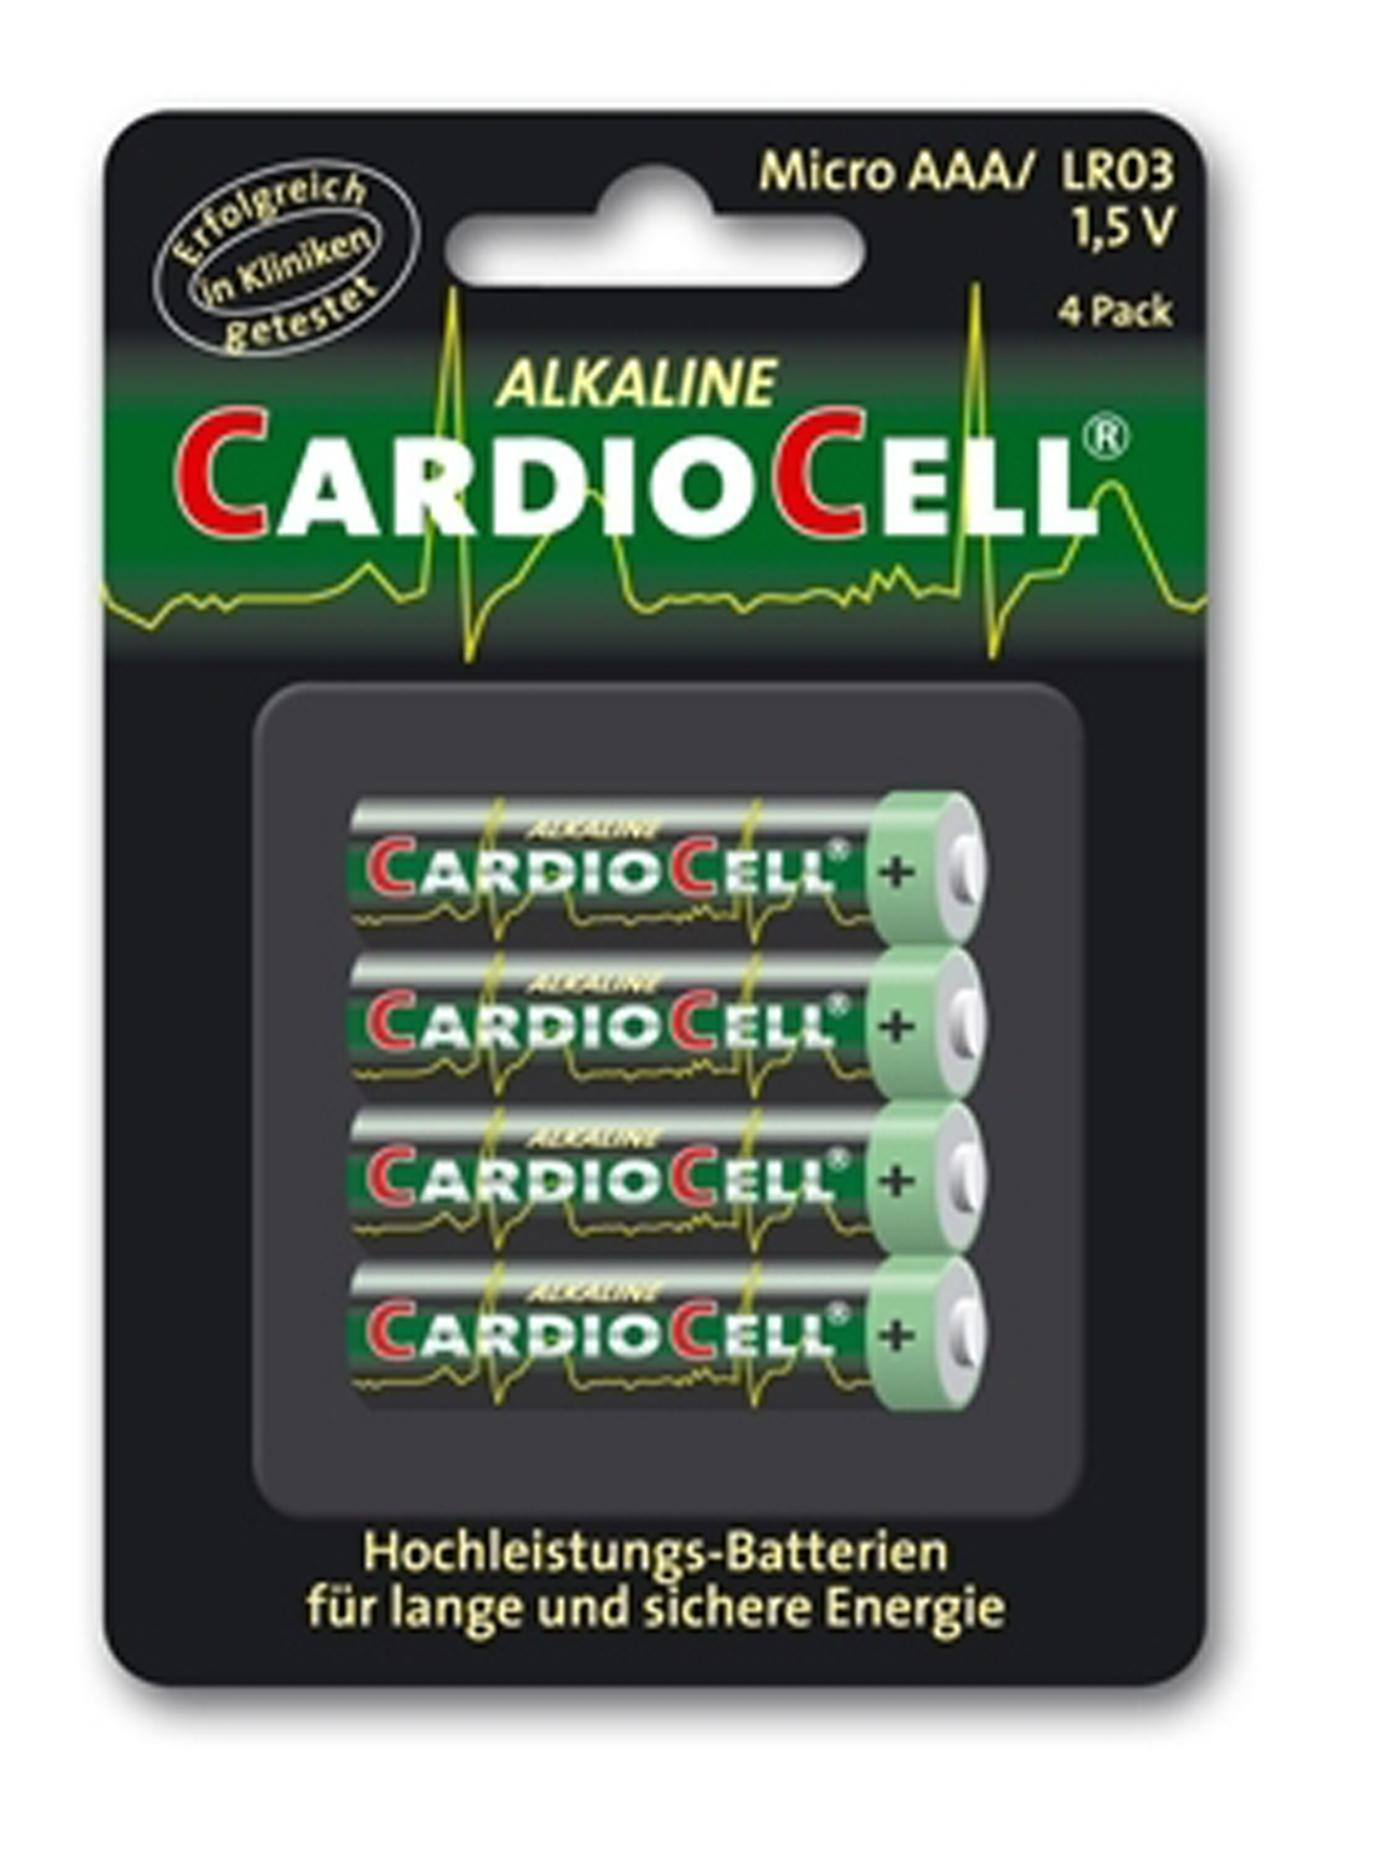 Image of Cardiocell Batterie AAA-LR03 4er Pack